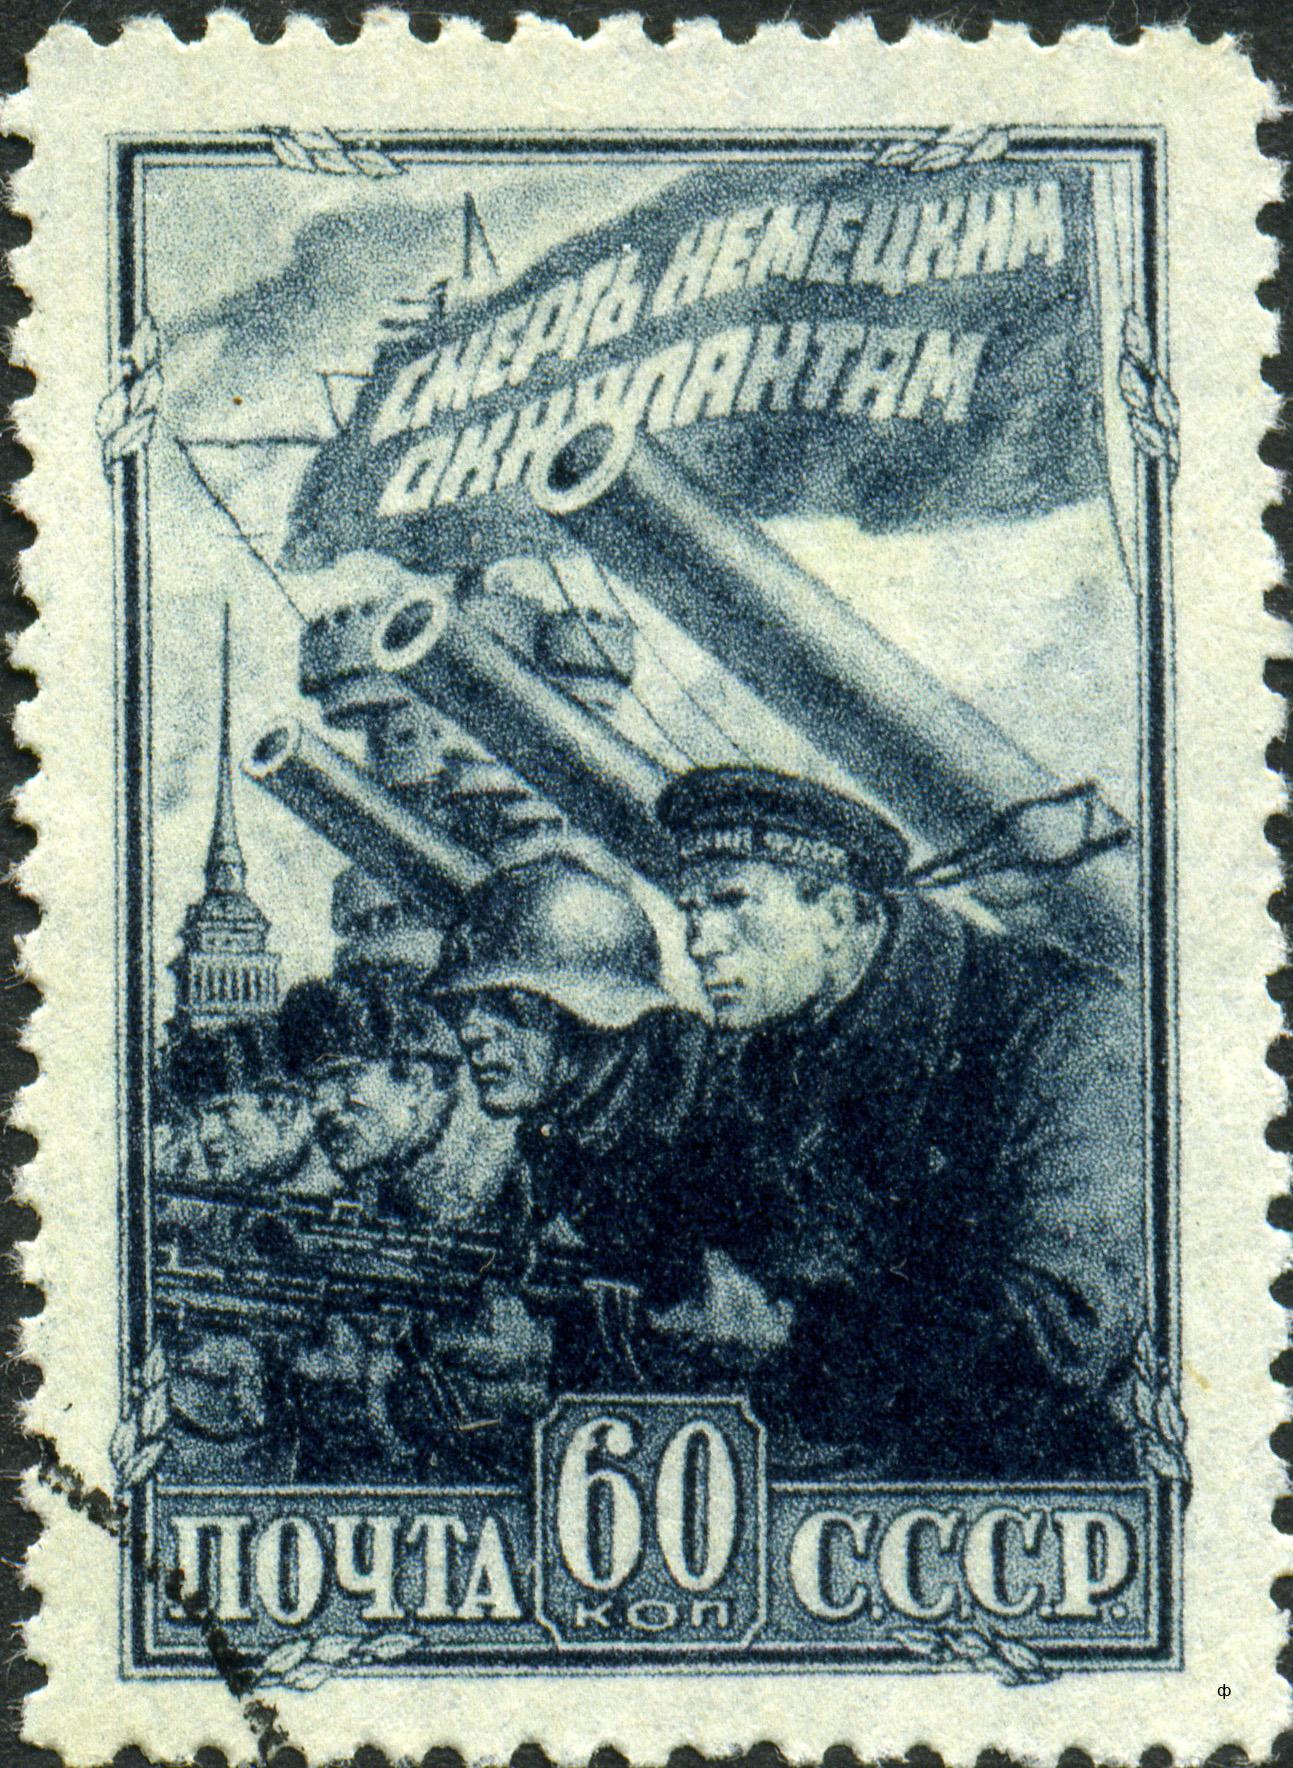 soviet postage stamp, soviet, postmark, mark, stamp, philately, Soviet-mail, retro, vintage, 20 century, USSR,